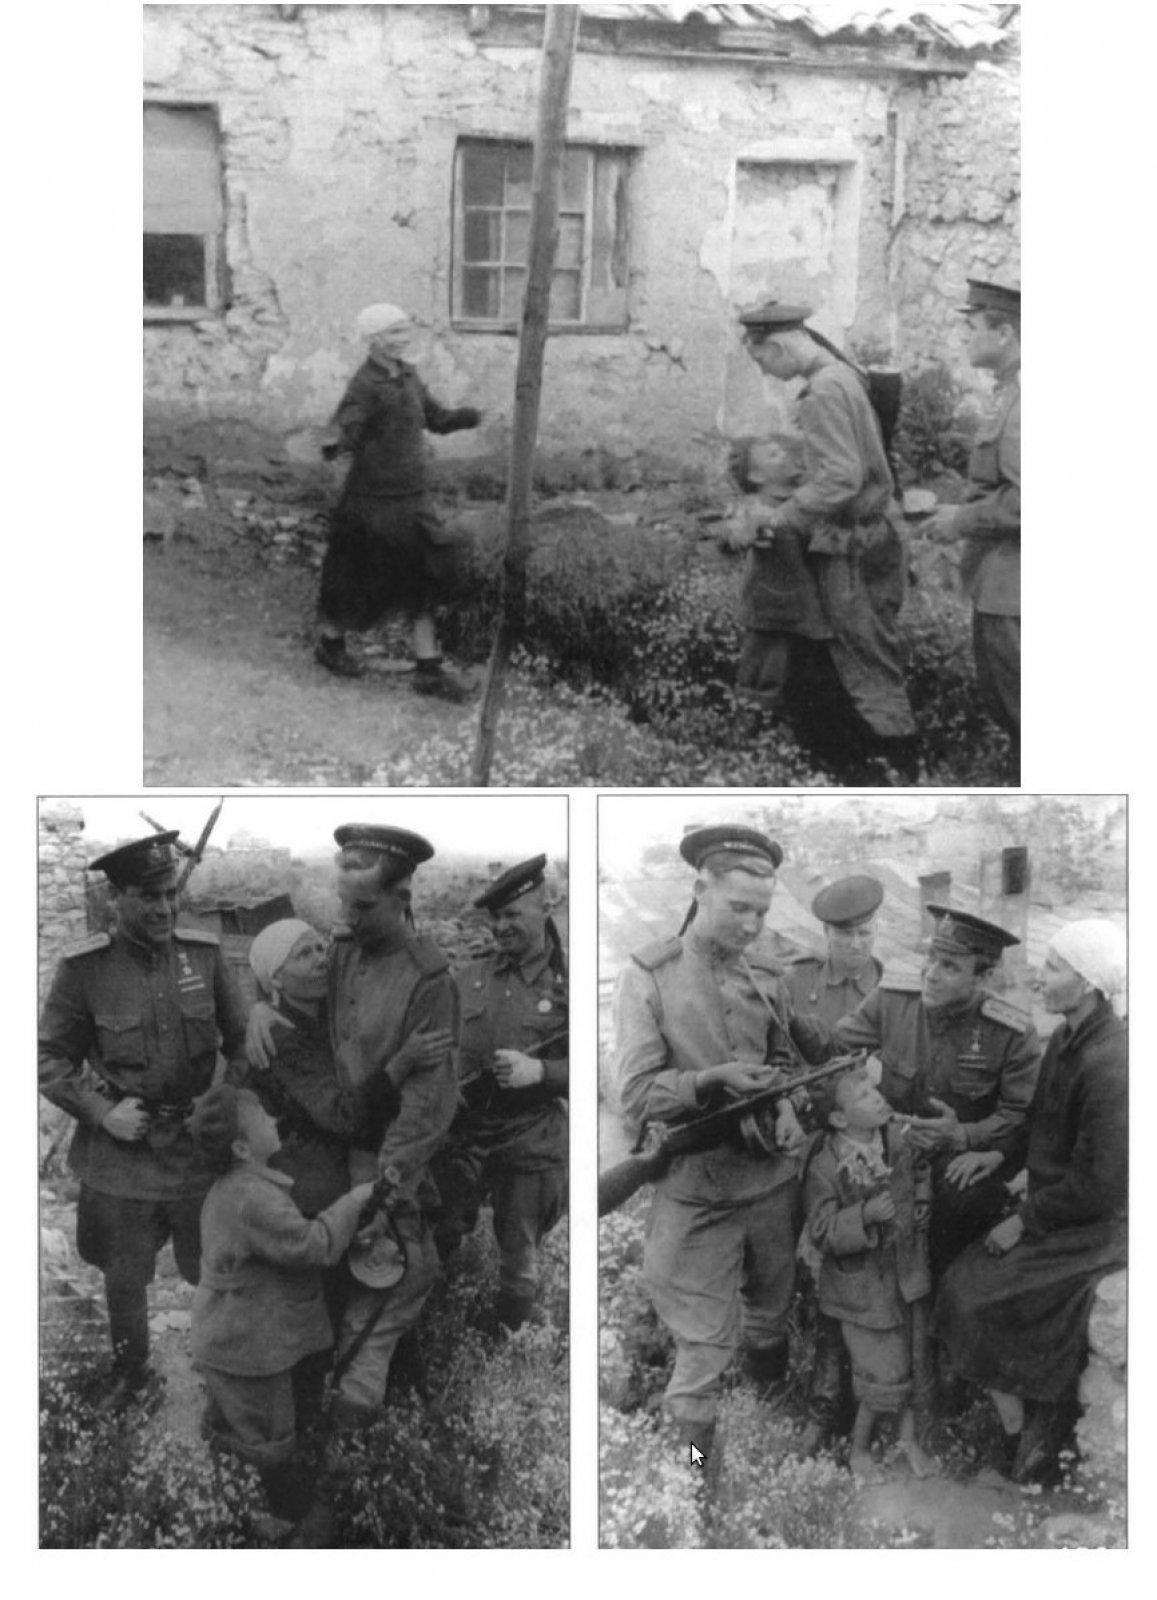 http://waralbum.ru/wp-content/uploads/alkivia/users/azz1.jpg